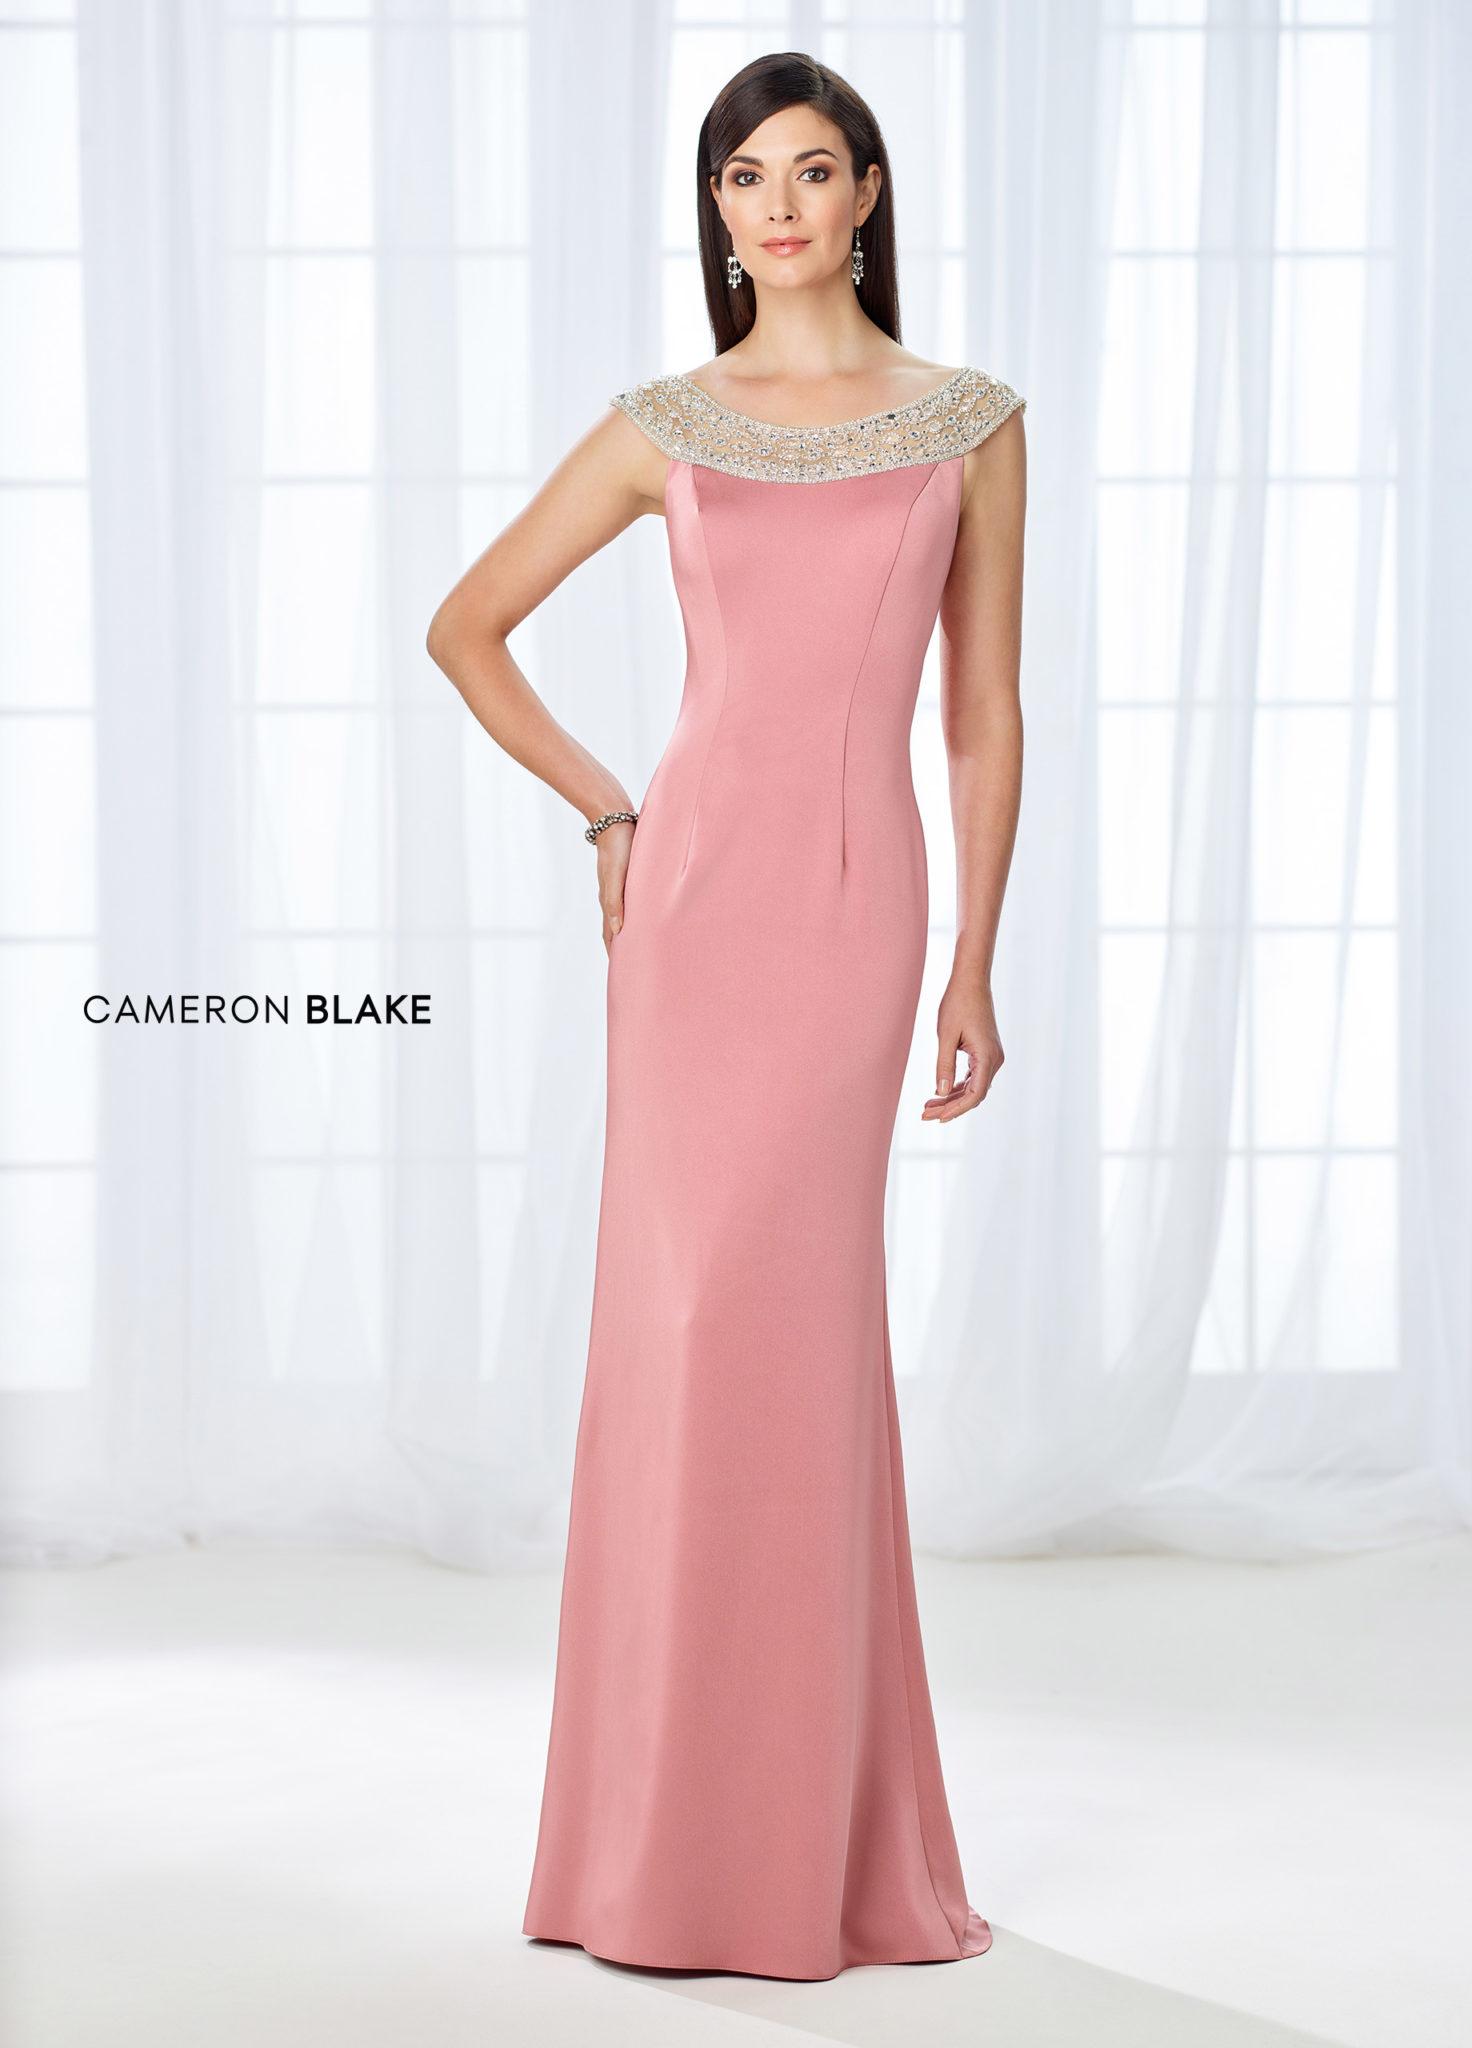 Cameron Blake Archives ⋆ Precious Memories Bridal Shop